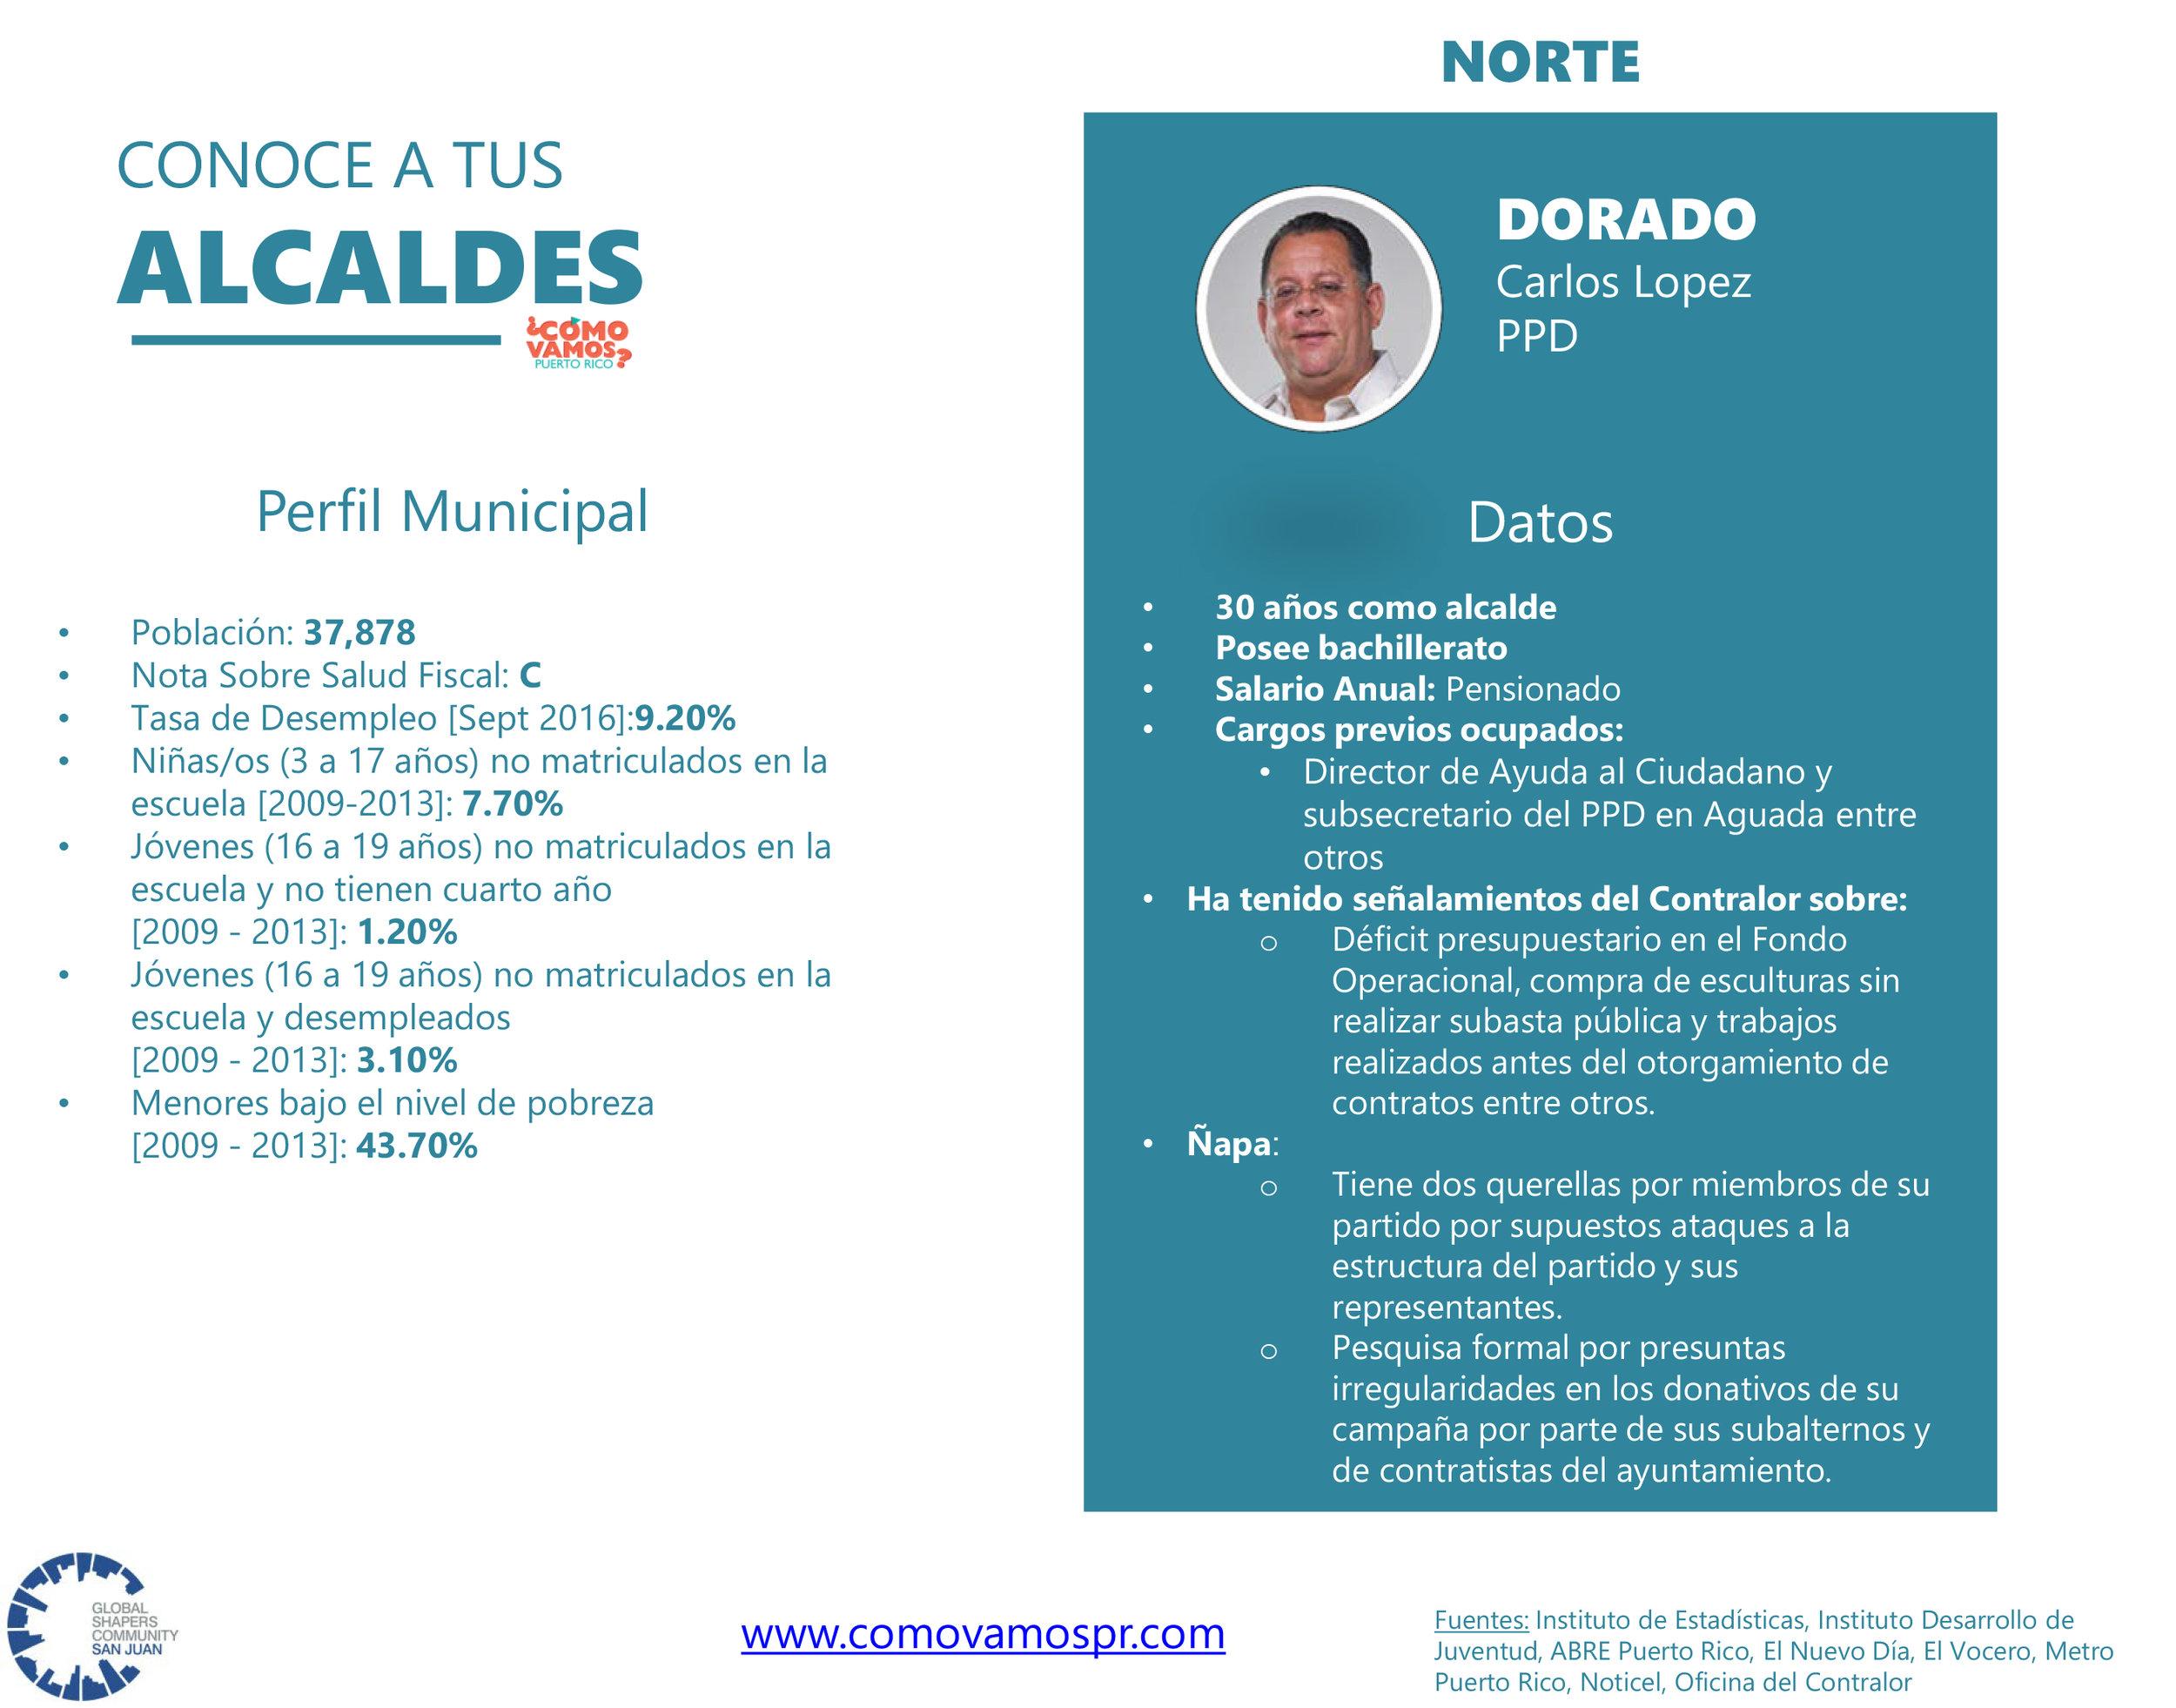 Alcaldes_Norte_Dorado.jpg